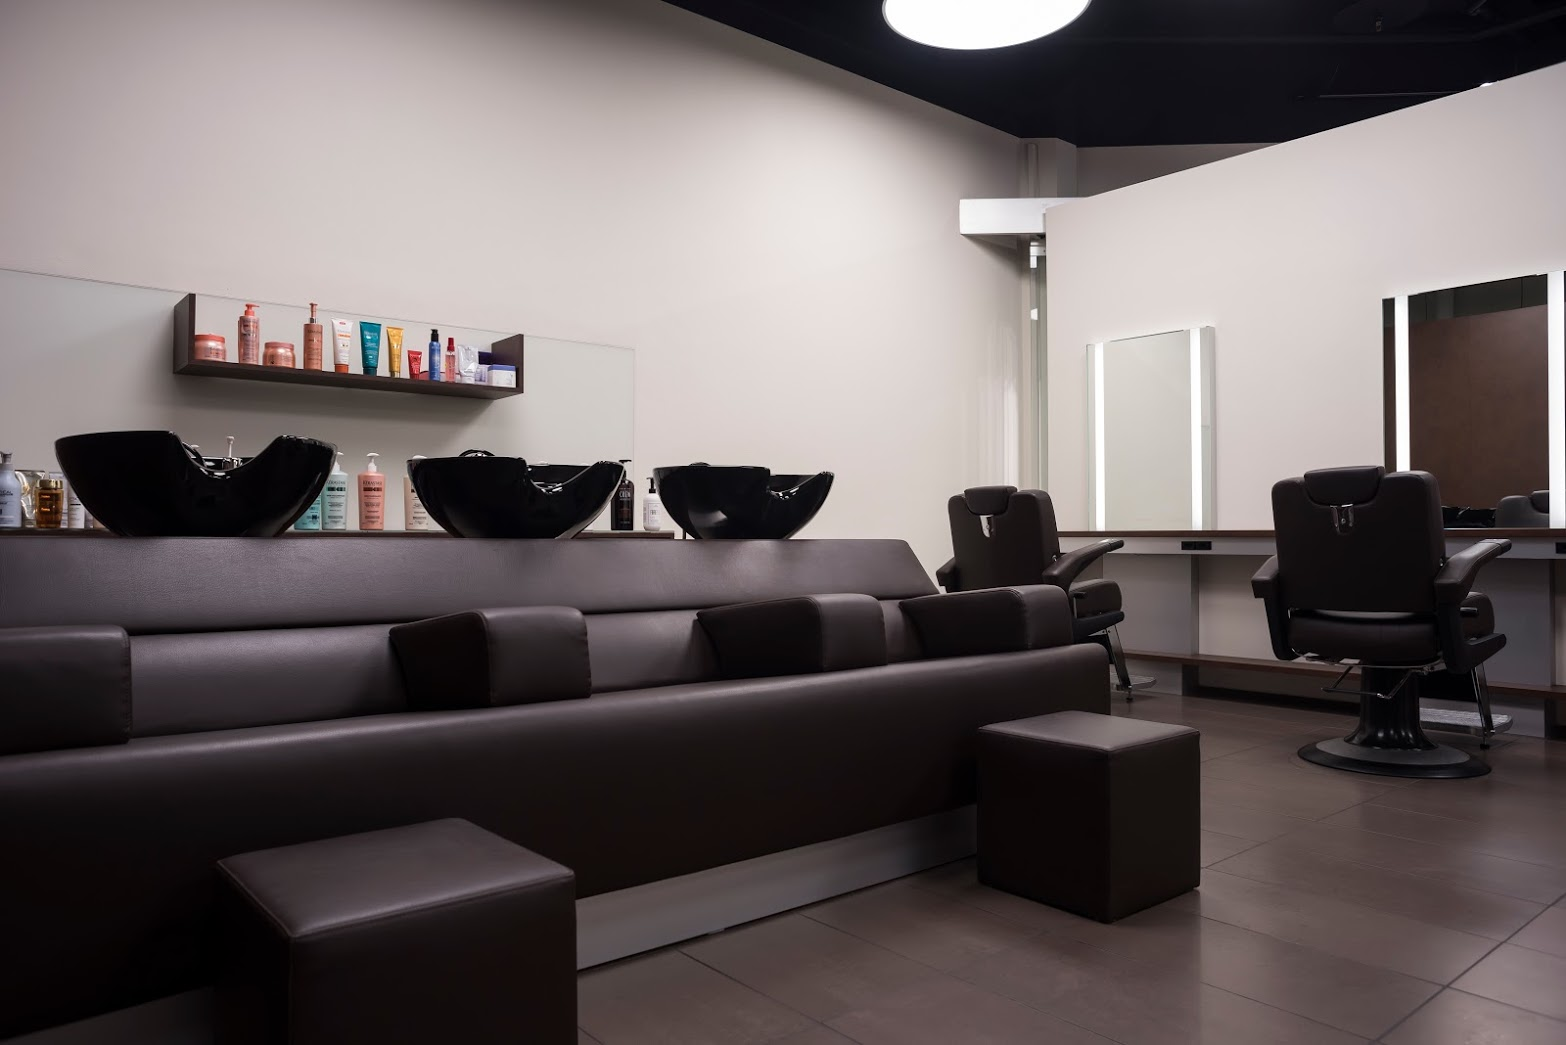 Coiffeur-Herlbingen-Hair-Terminal-Friseur-Waschbecken